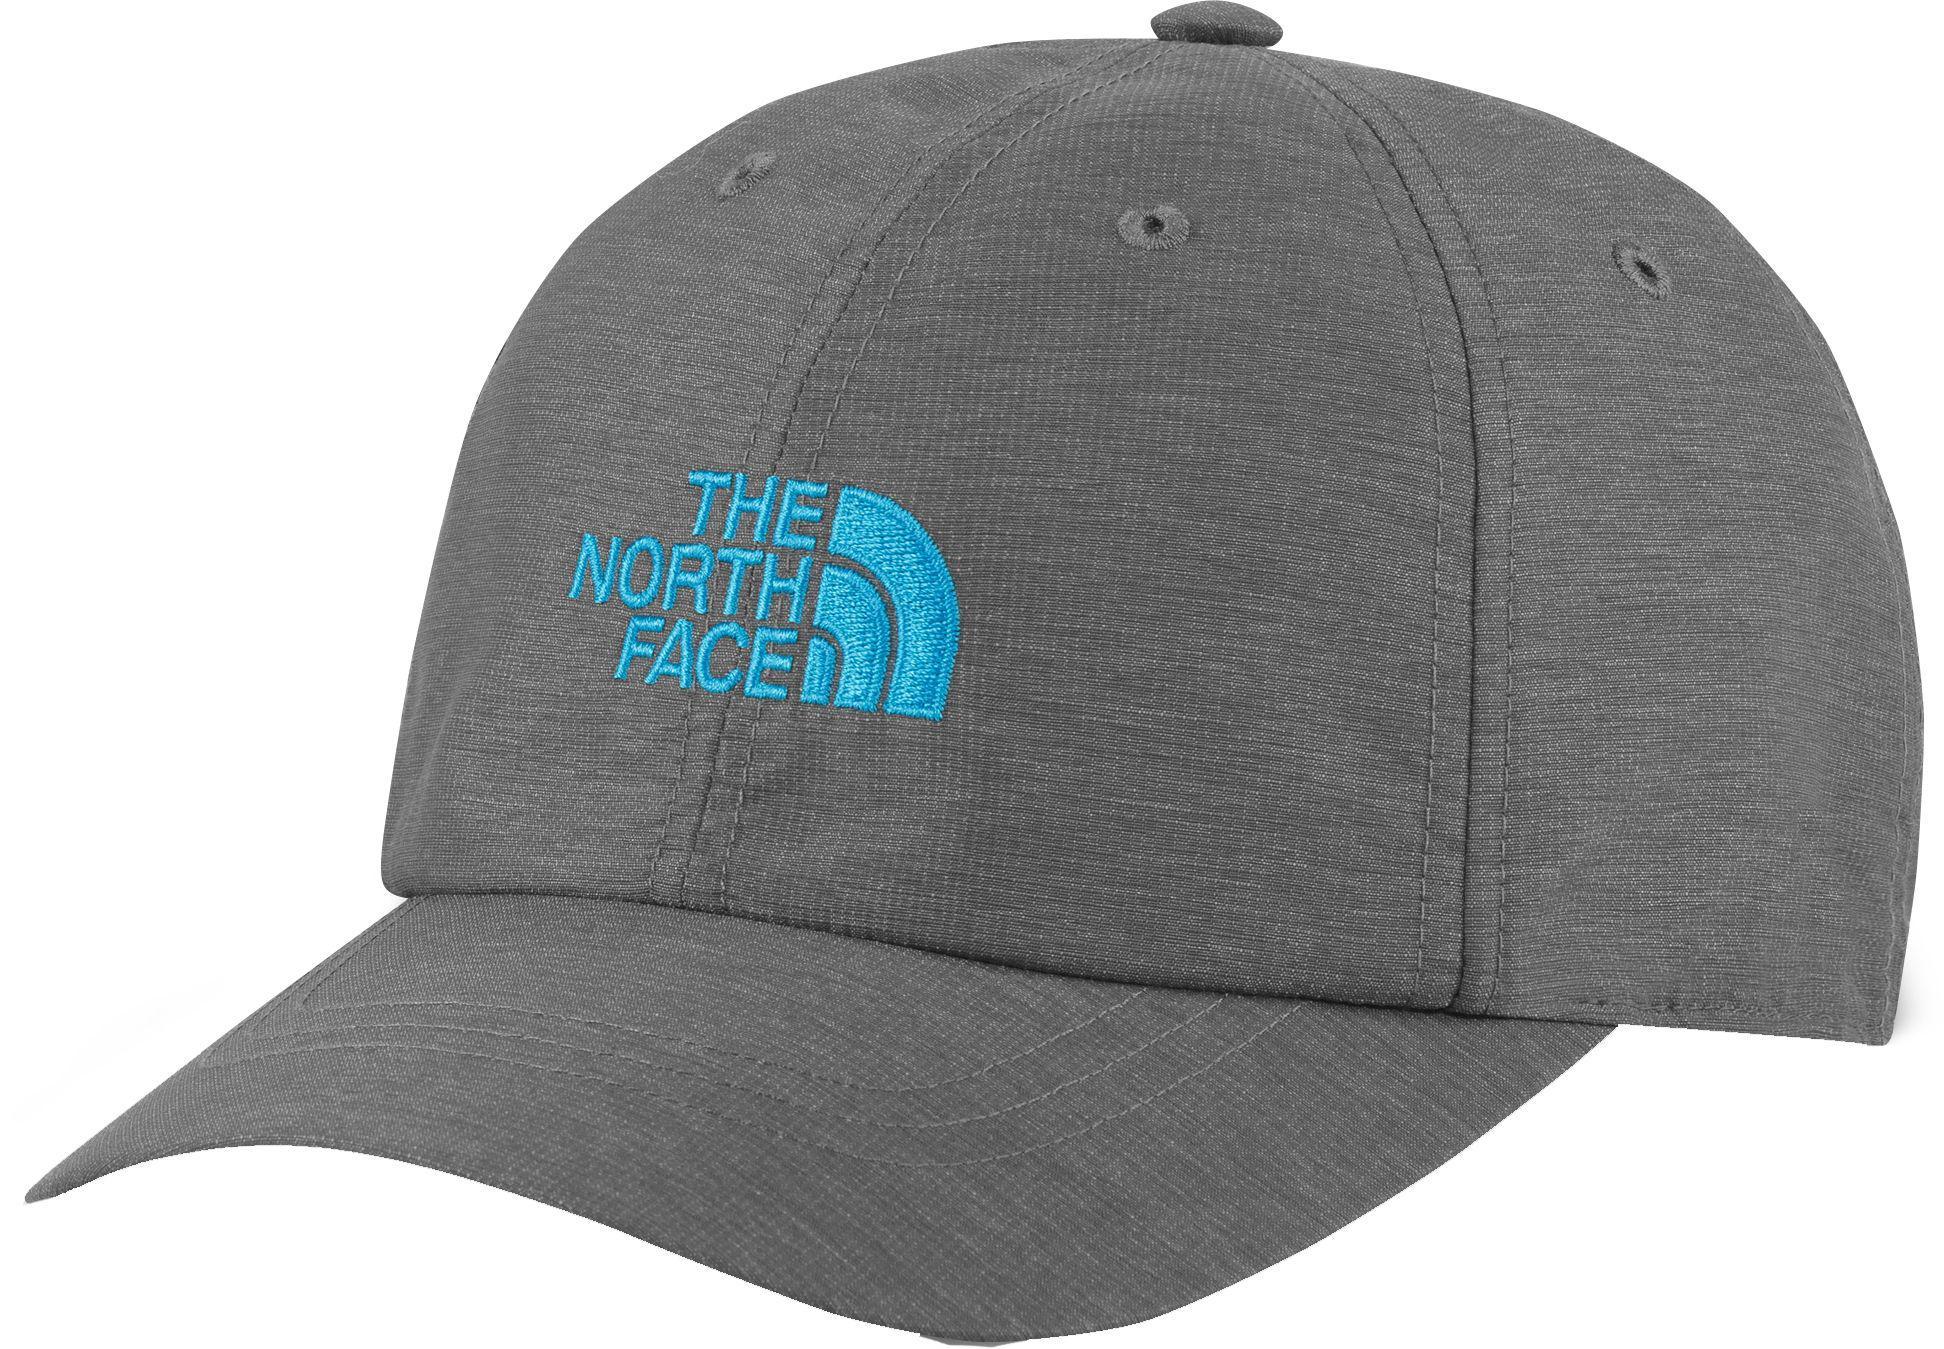 bcb61aa66ba Lyst - The North Face Horizon Ball Cap in Gray for Men